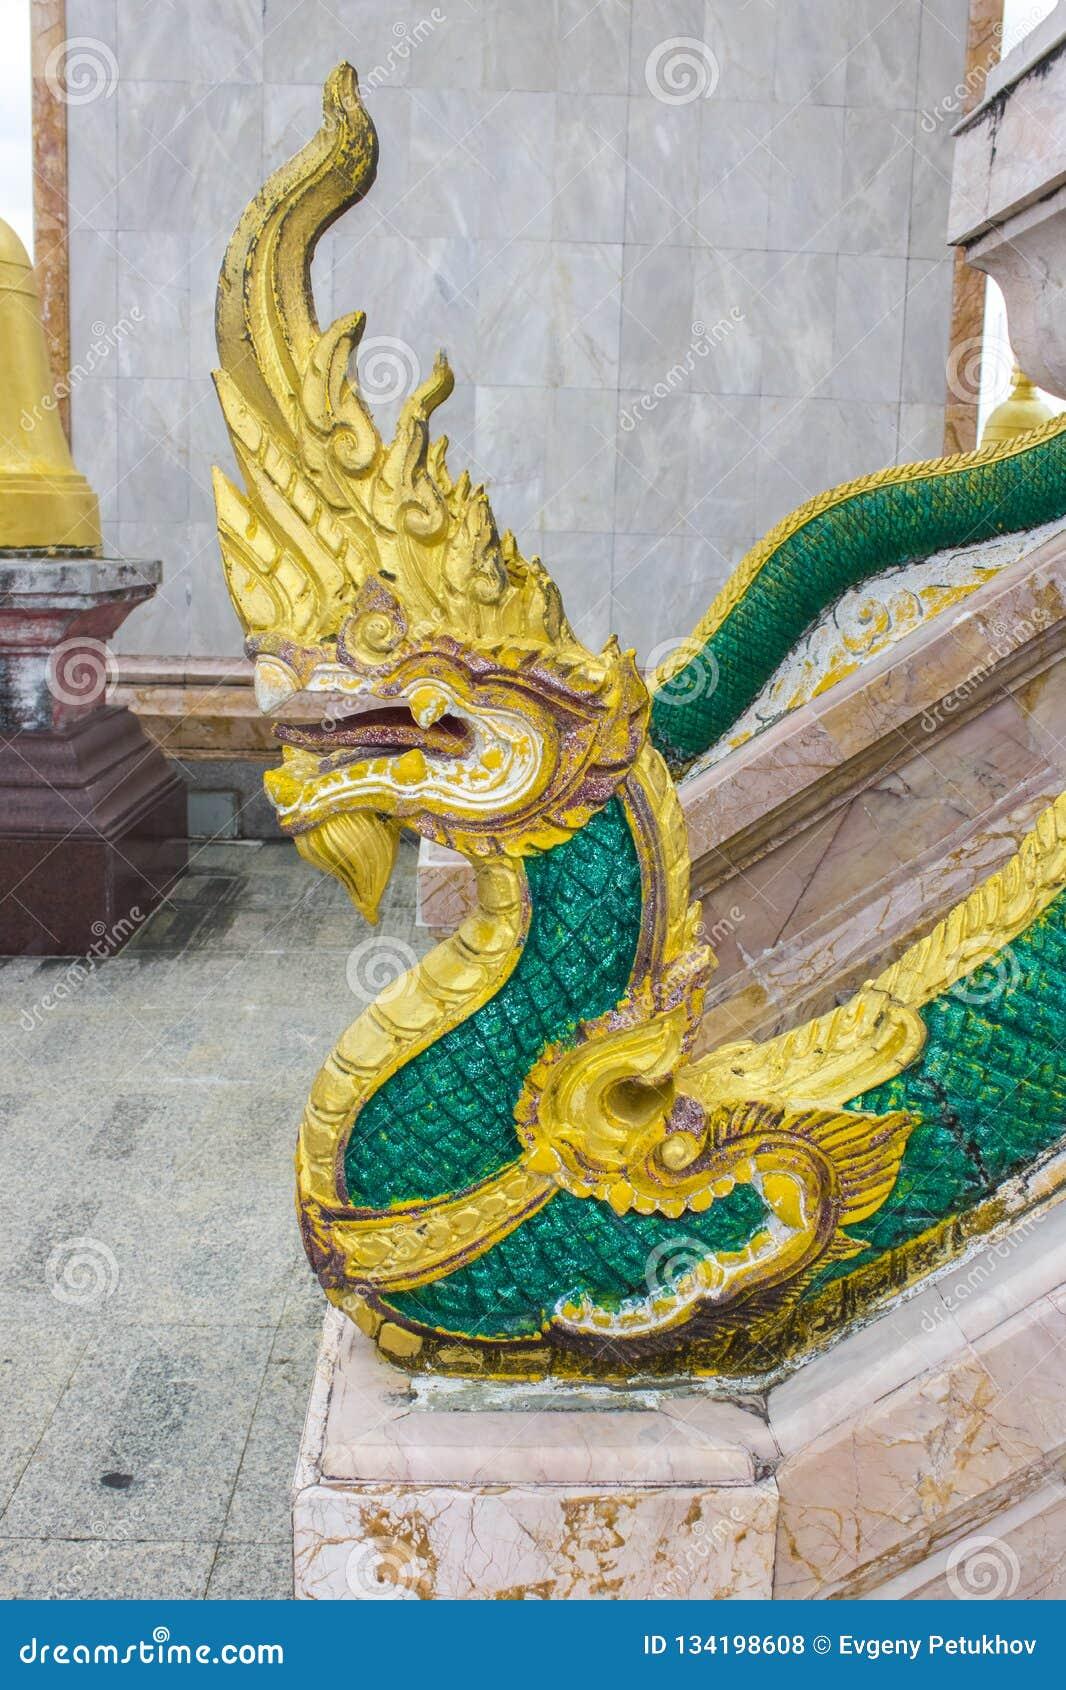 Golden dragon king thailand wikipedia steroid anabolik burung